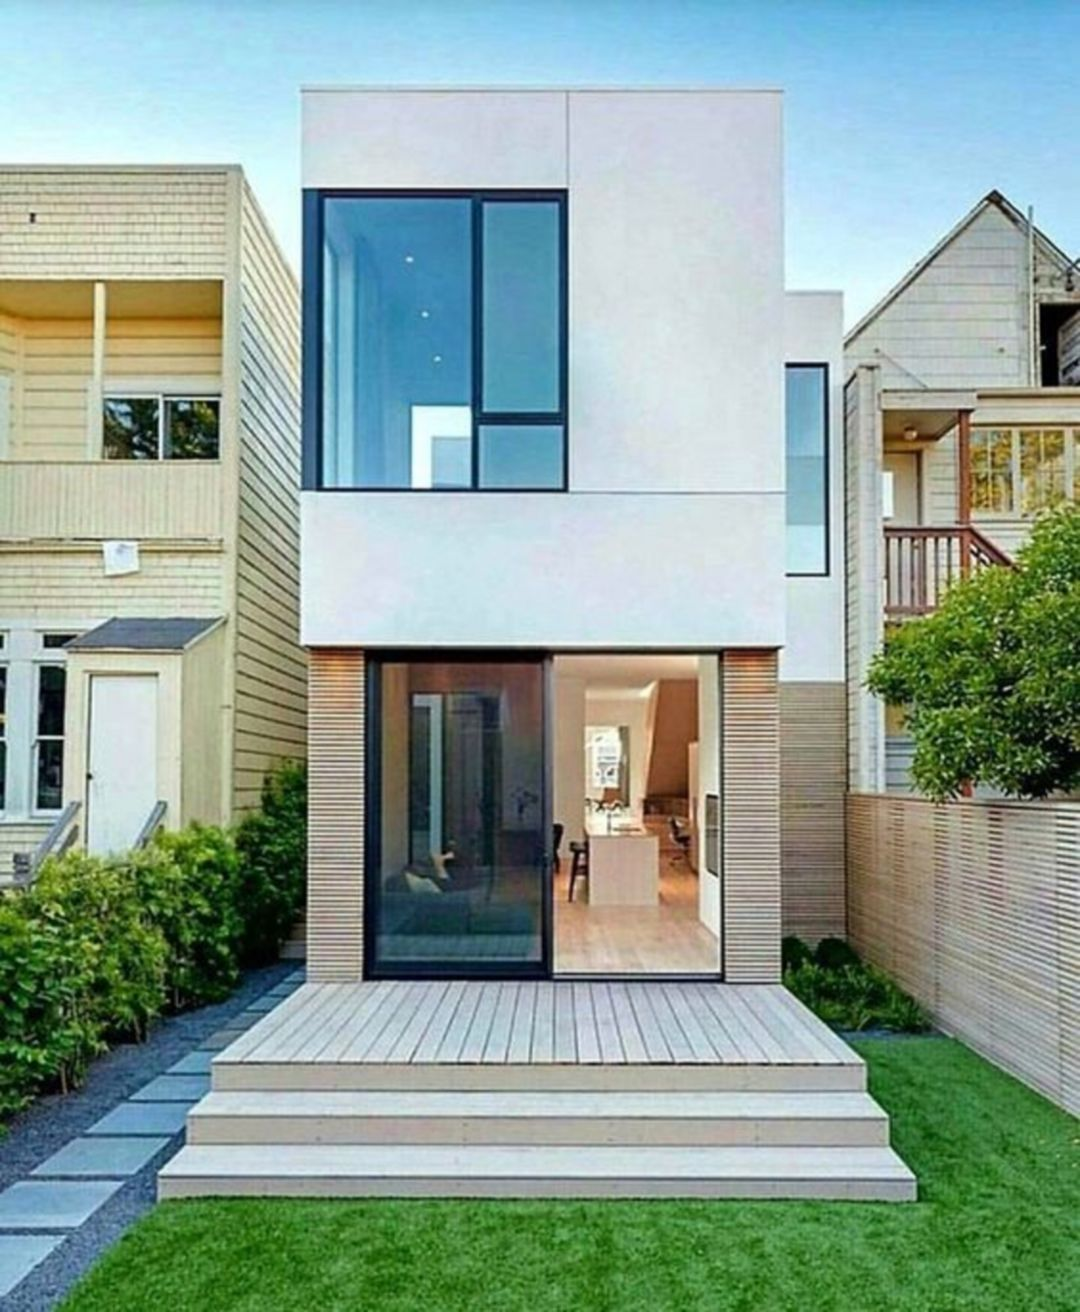 20 Best Of Minimalist House Designs Simple Unique And Modern Modern Minimalist House Modern Small House Design Minimalist House Design